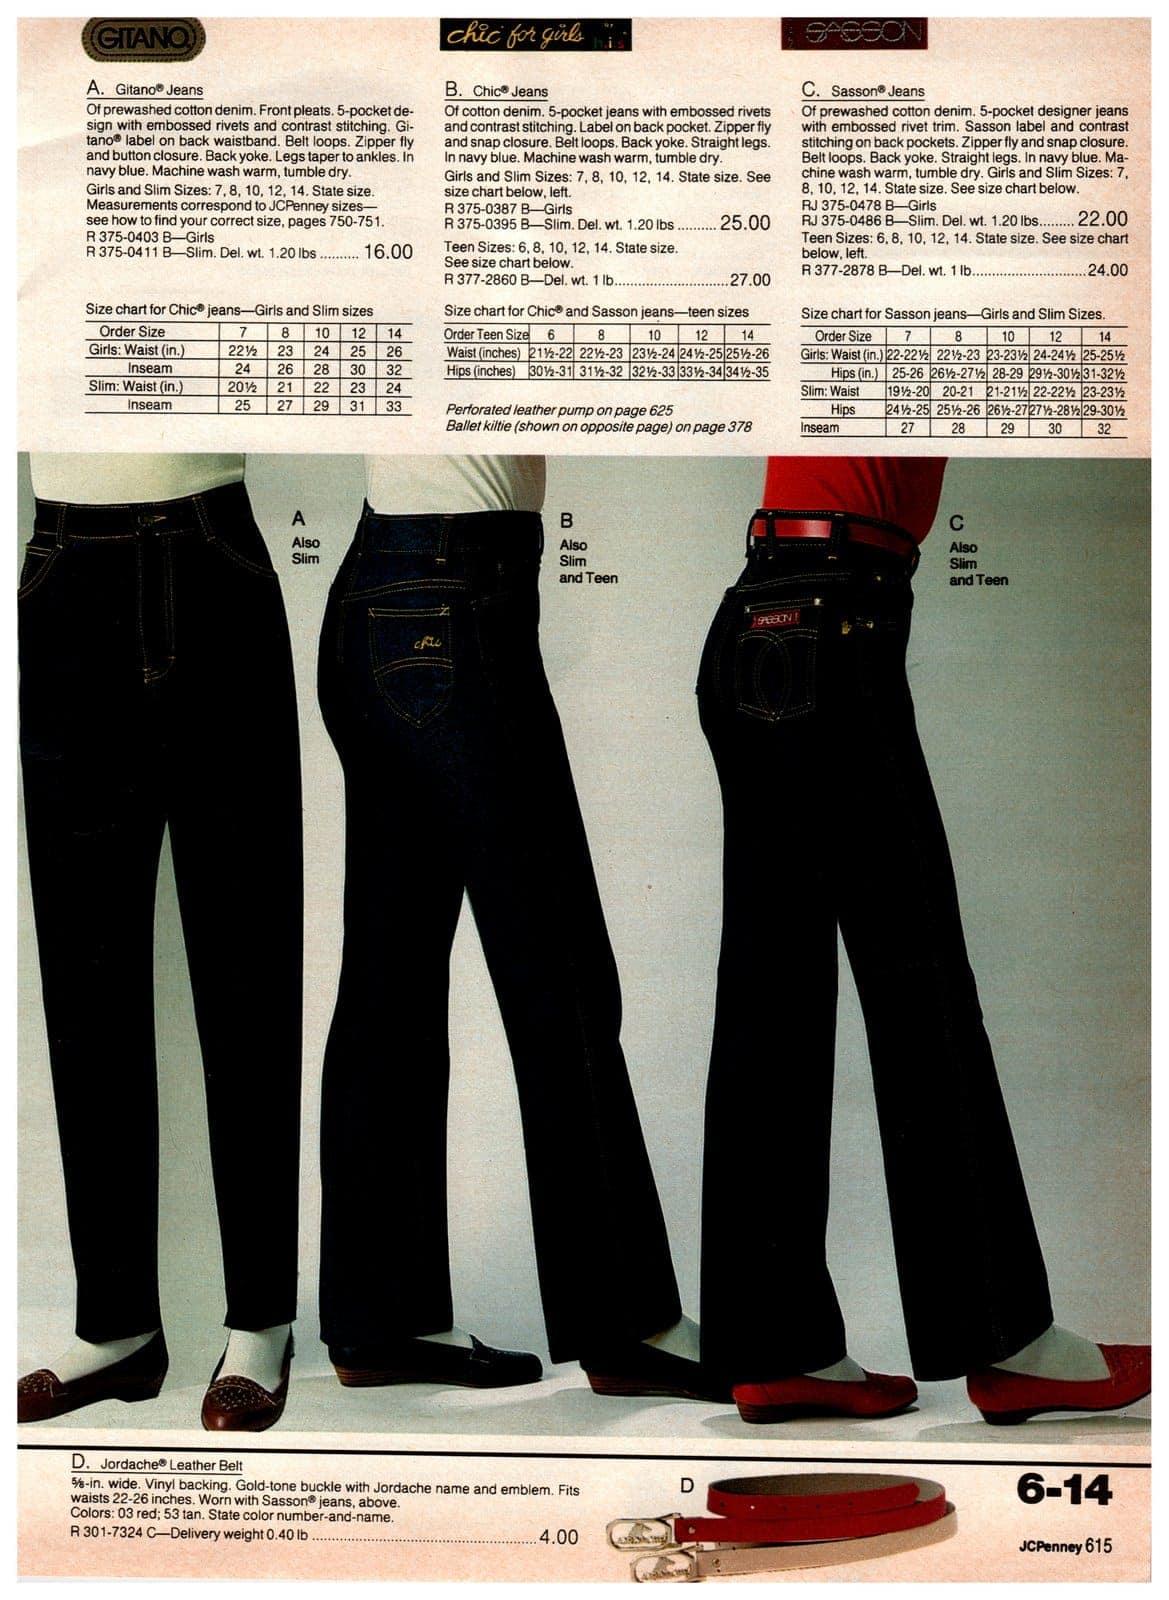 Popular designer jeans, including Gitano, Chic for Girls and Sassoon 5-pocket jeans - plus a Jordache leather belt